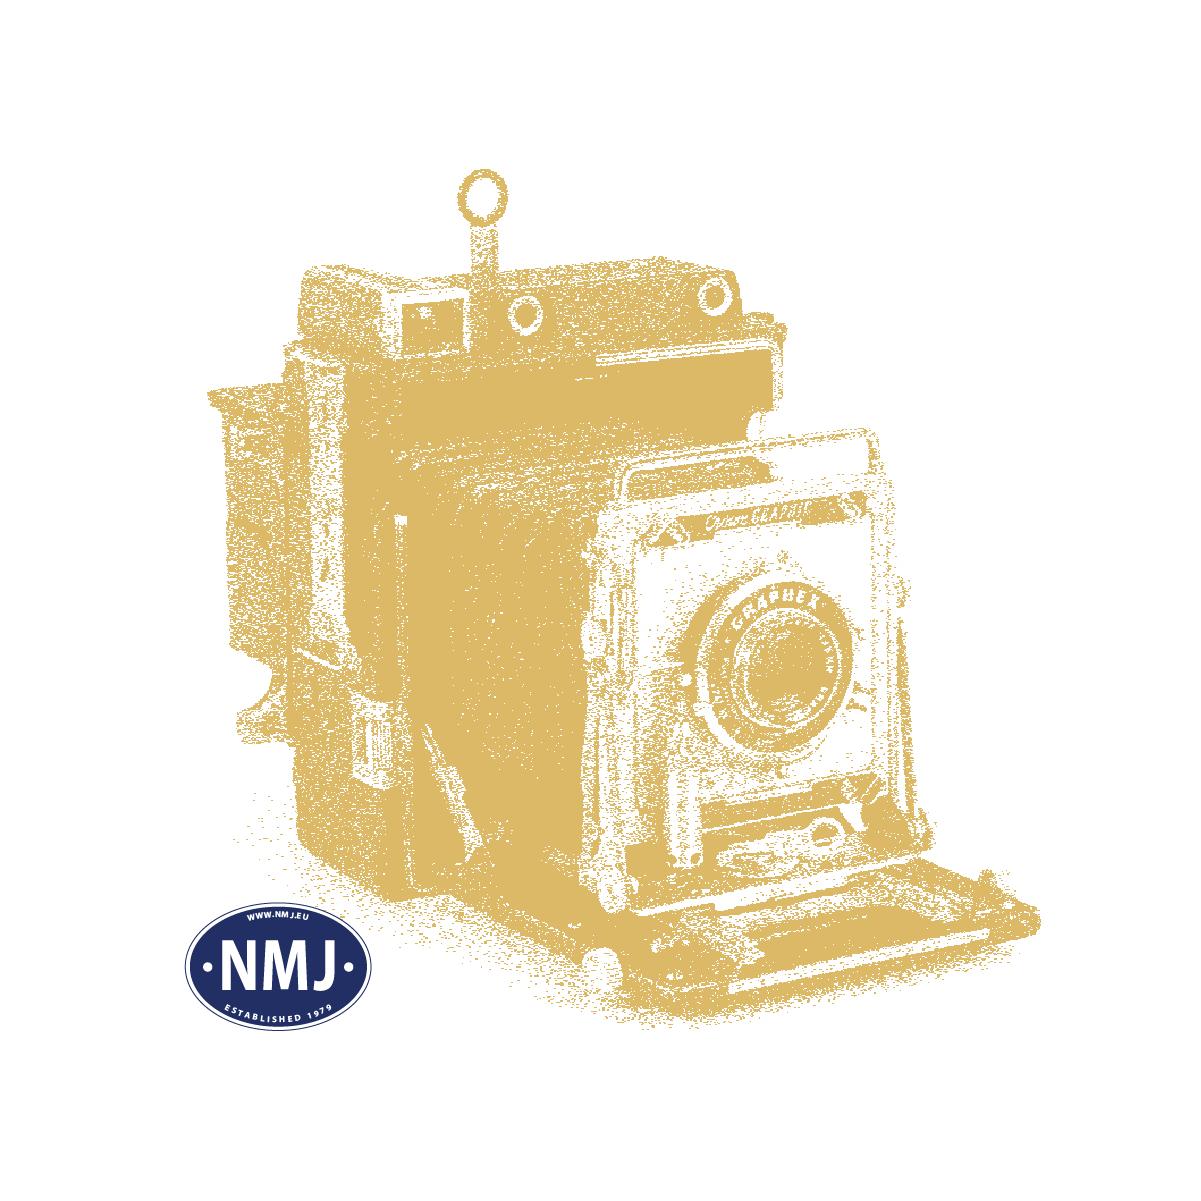 NMJT131.302 - NMJ Topline NSB B3-2 Type 3 25517, Nydesign